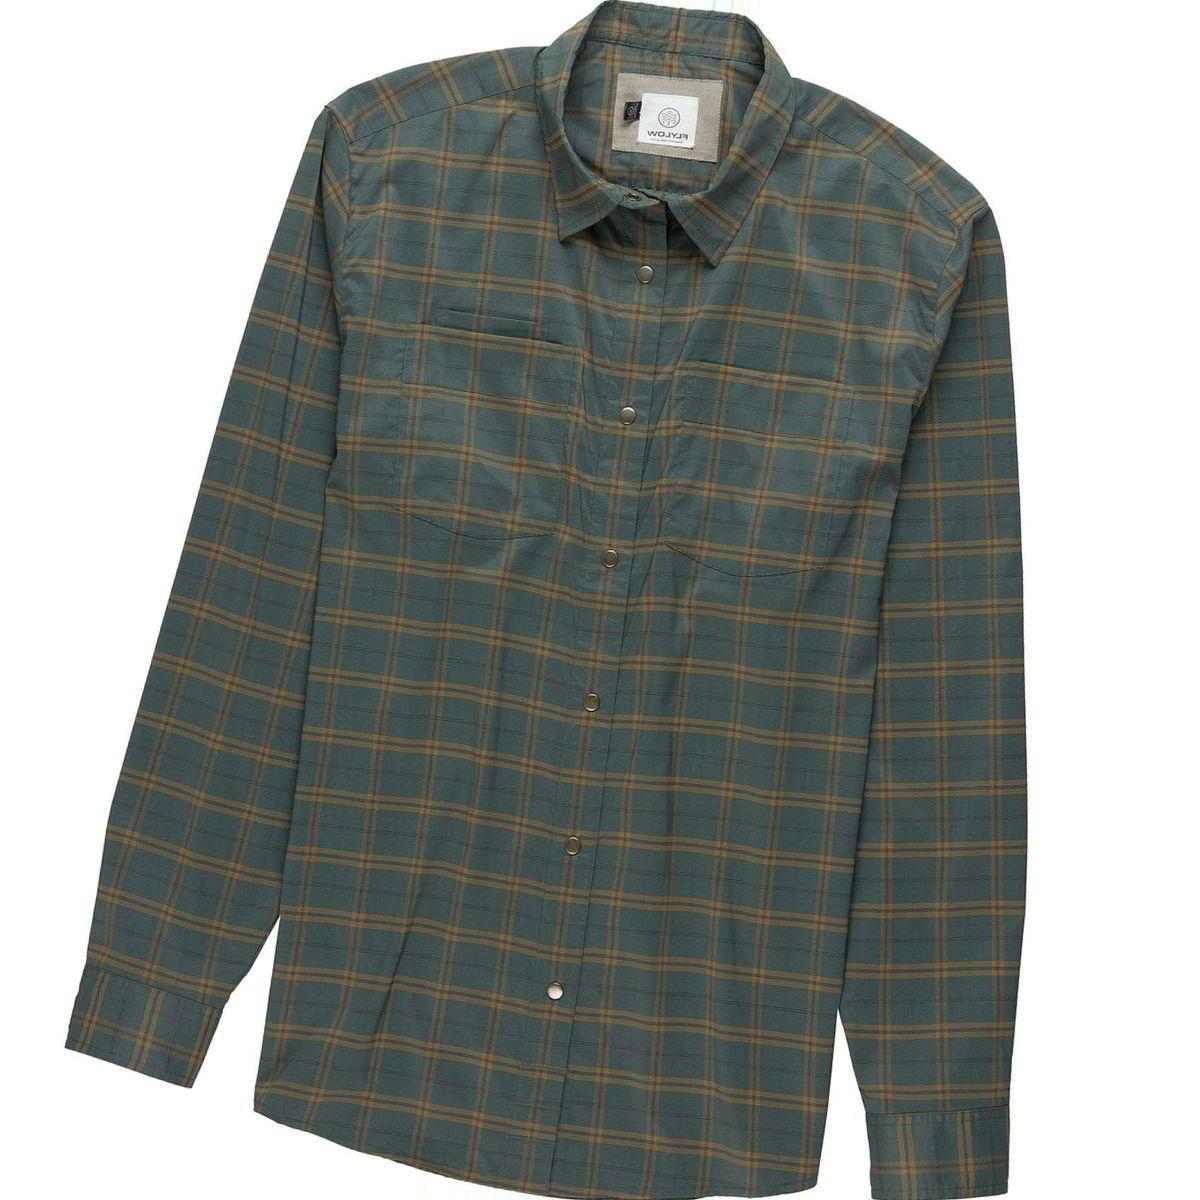 Flylow Royal Long-Sleeve Shirt - Men's